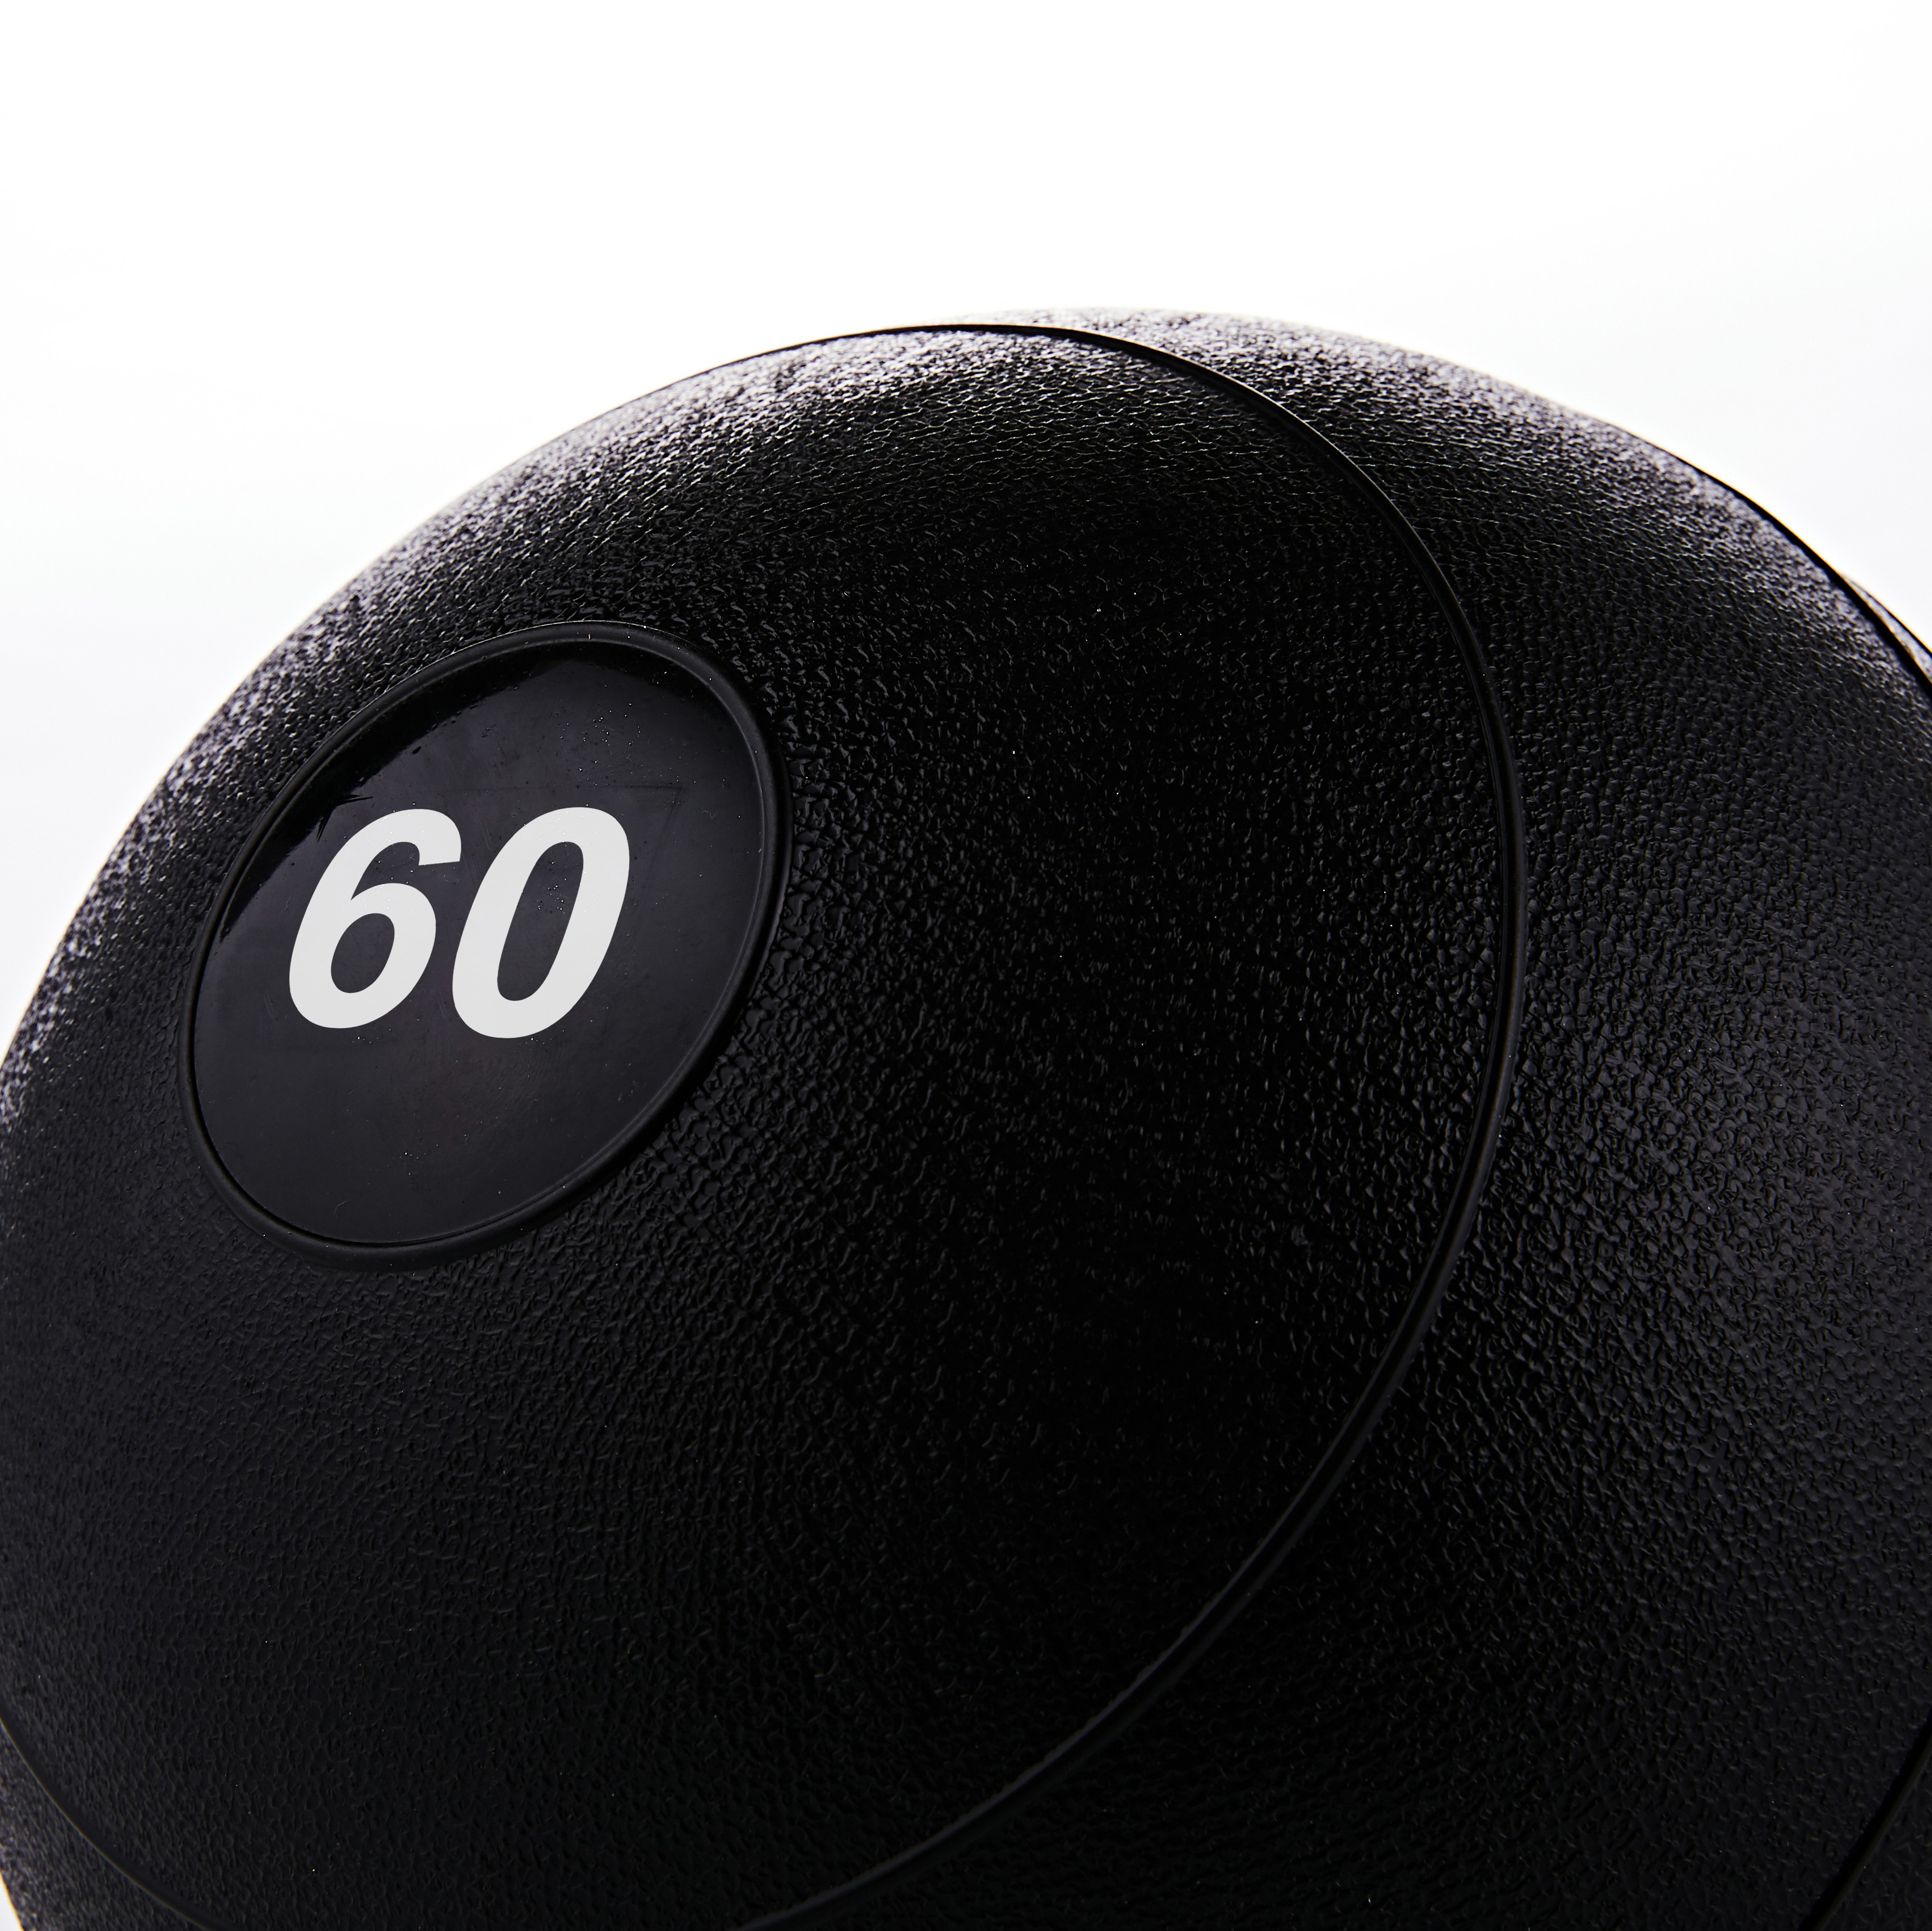 Vitos 重力球 60磅 27公斤 橡膠 藥球 平衡球 健身訓練球 復健球 健身能量球 私教訓練